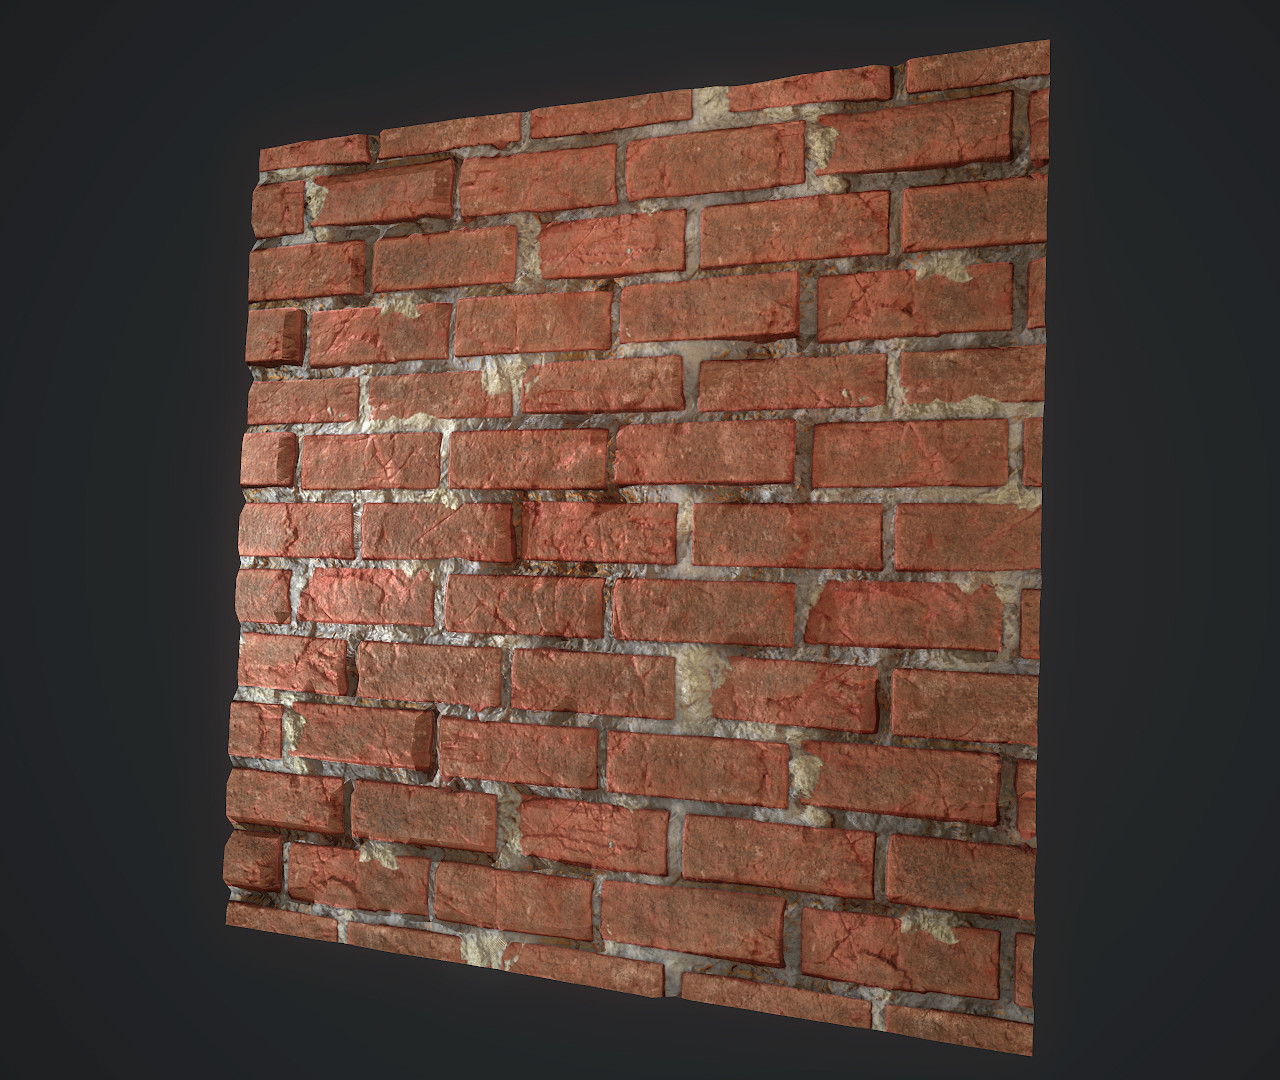 Pawel margacz bricks